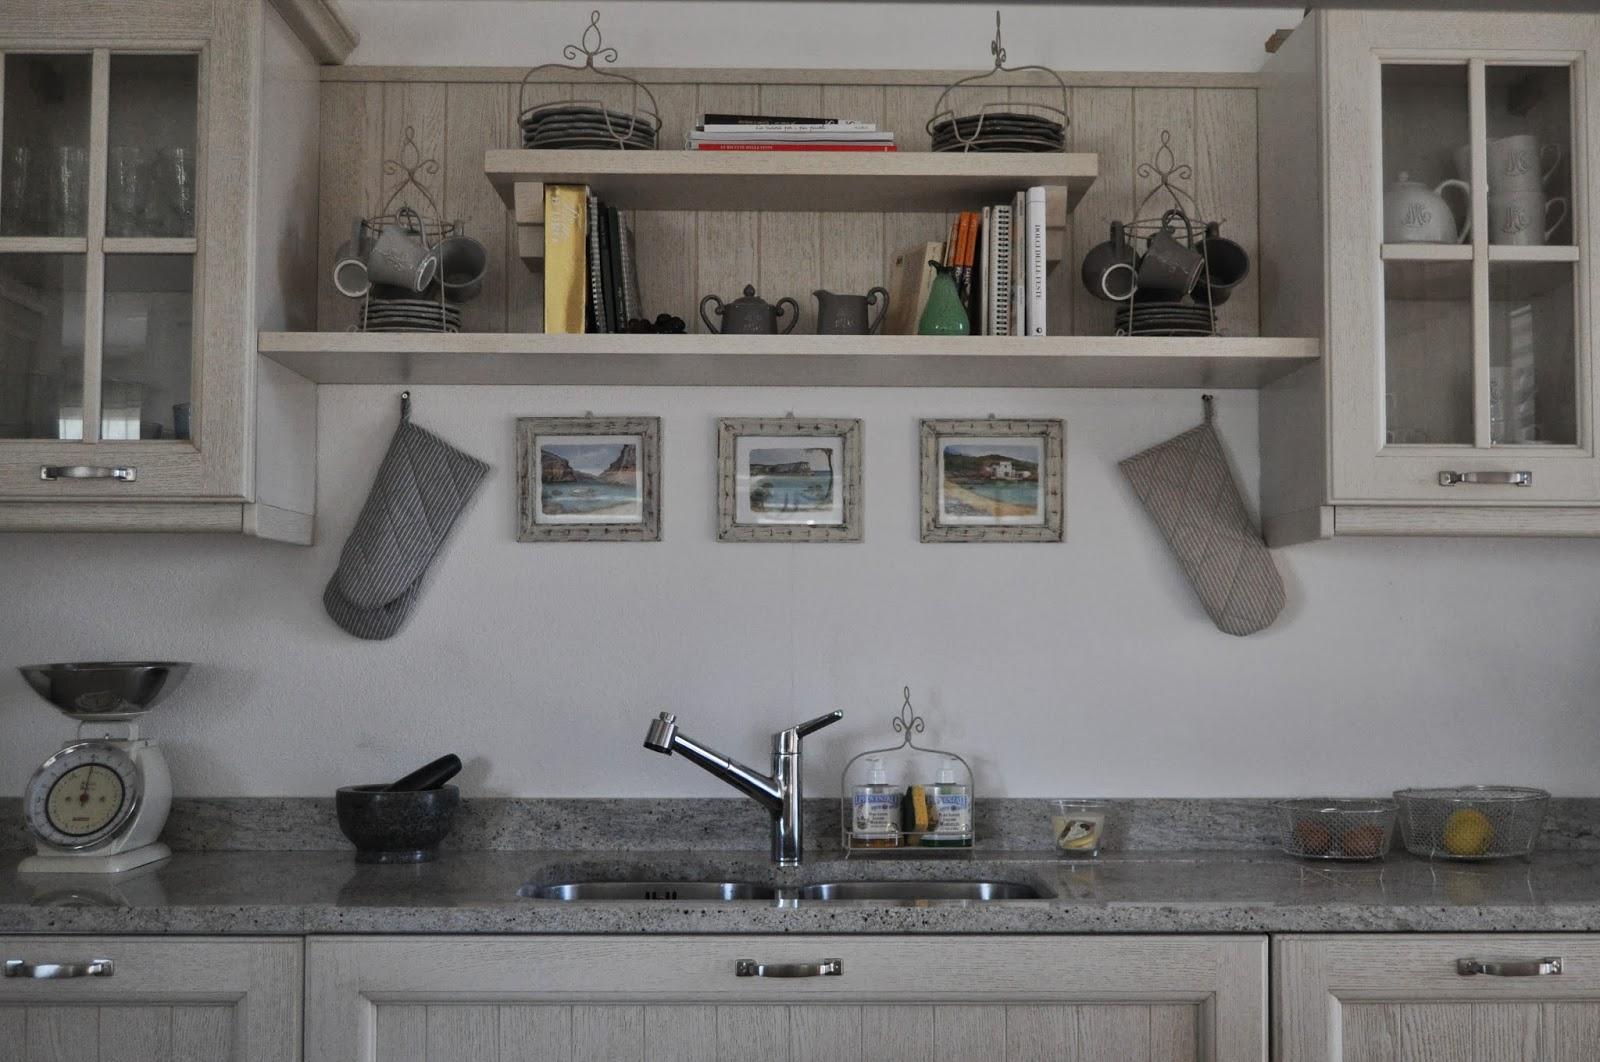 Cucina Sala | 41 Immagine Cucina E Sala Da Pranzo Fantastico Cucina ...